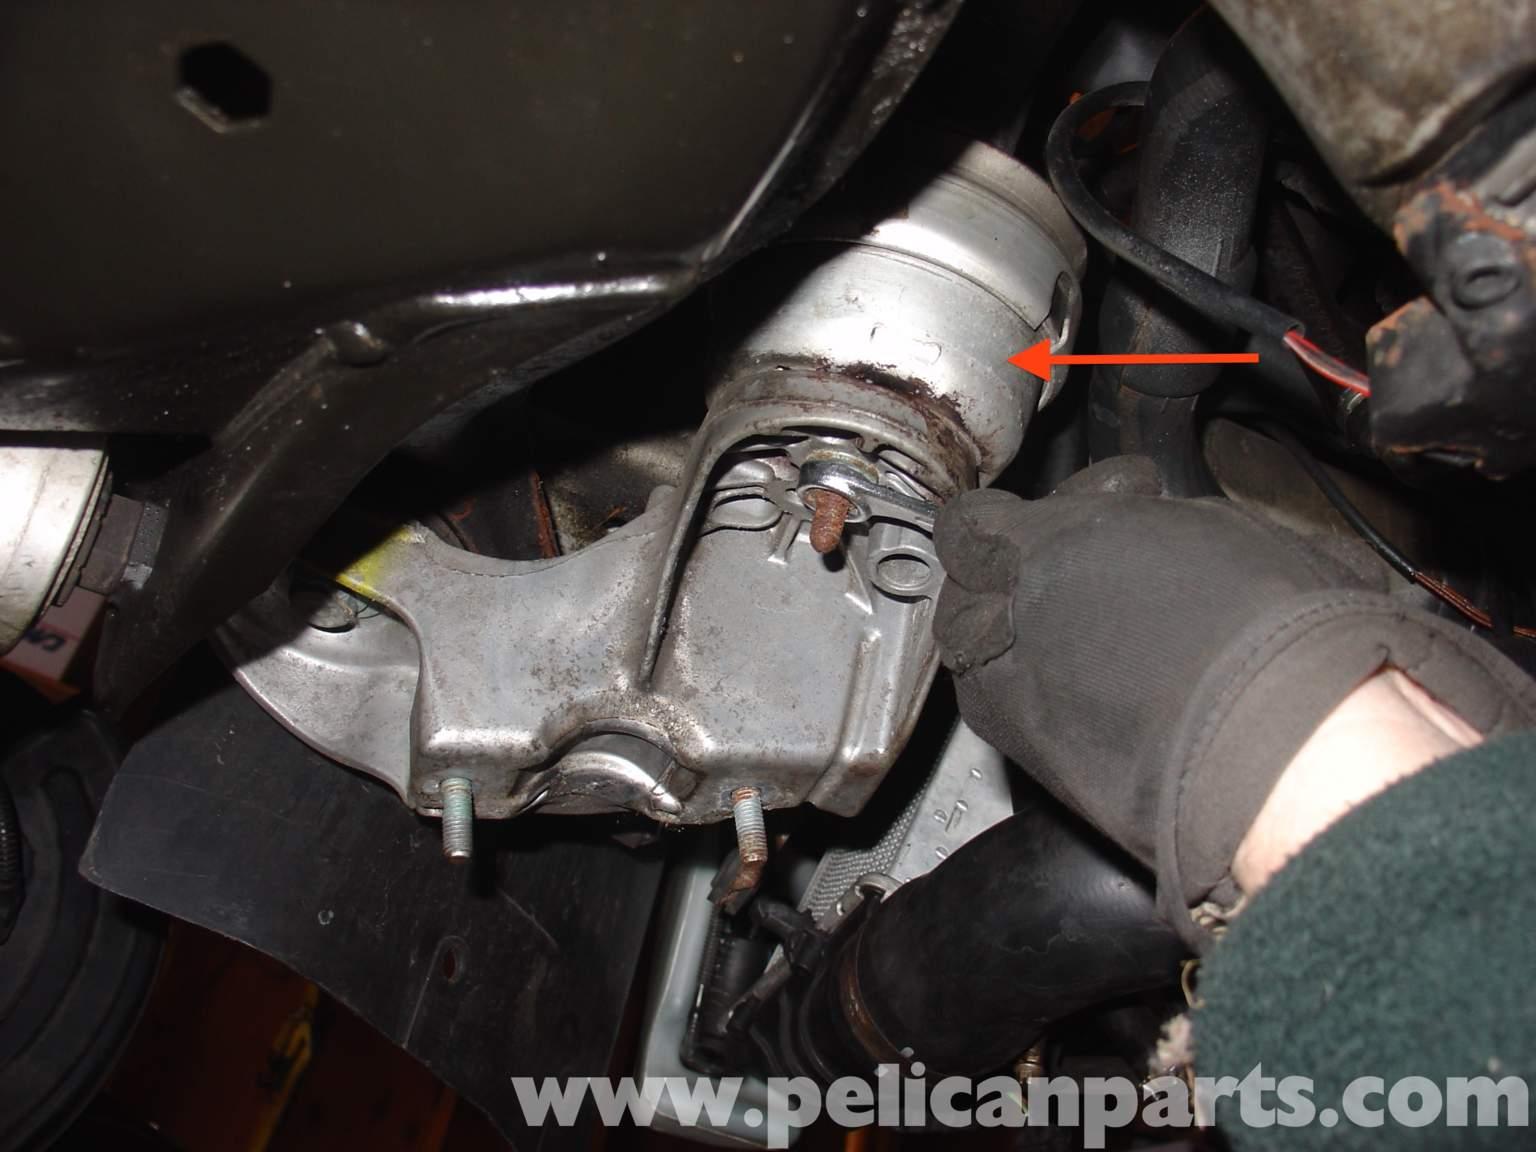 Audi A4 Quattro B5 Engine Mount Replacement (1.8T 1997-2001) | Pelican Parts DIY Maintenance Article